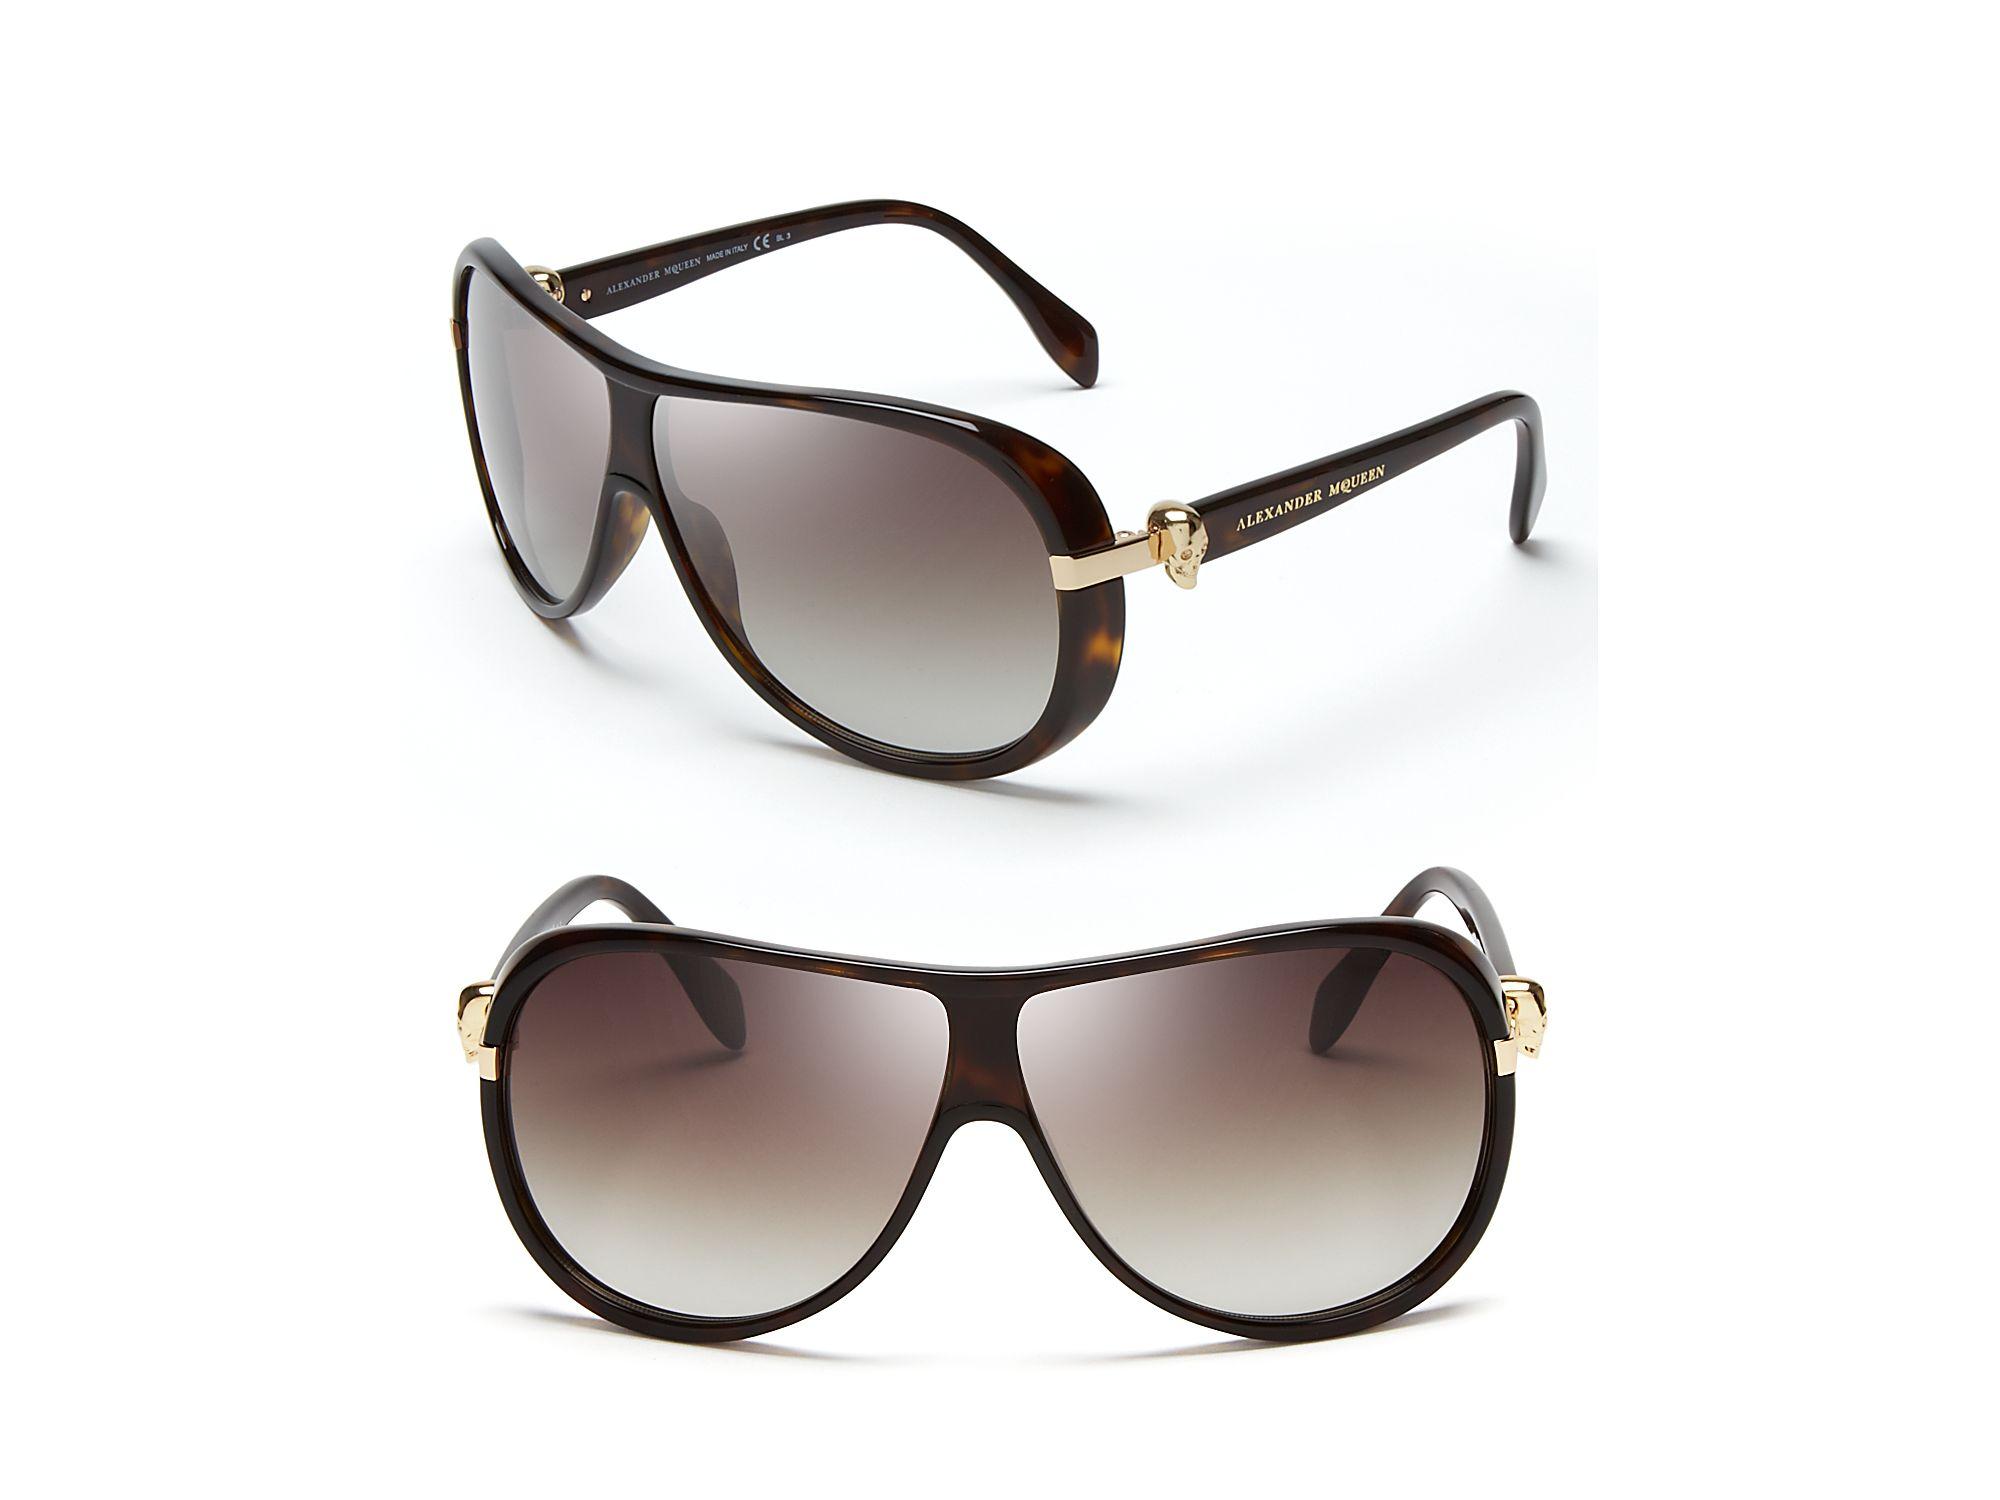 7601474ecd1c Lyst - Alexander McQueen Skull Temple Aviator Sunglasses in Brown ...